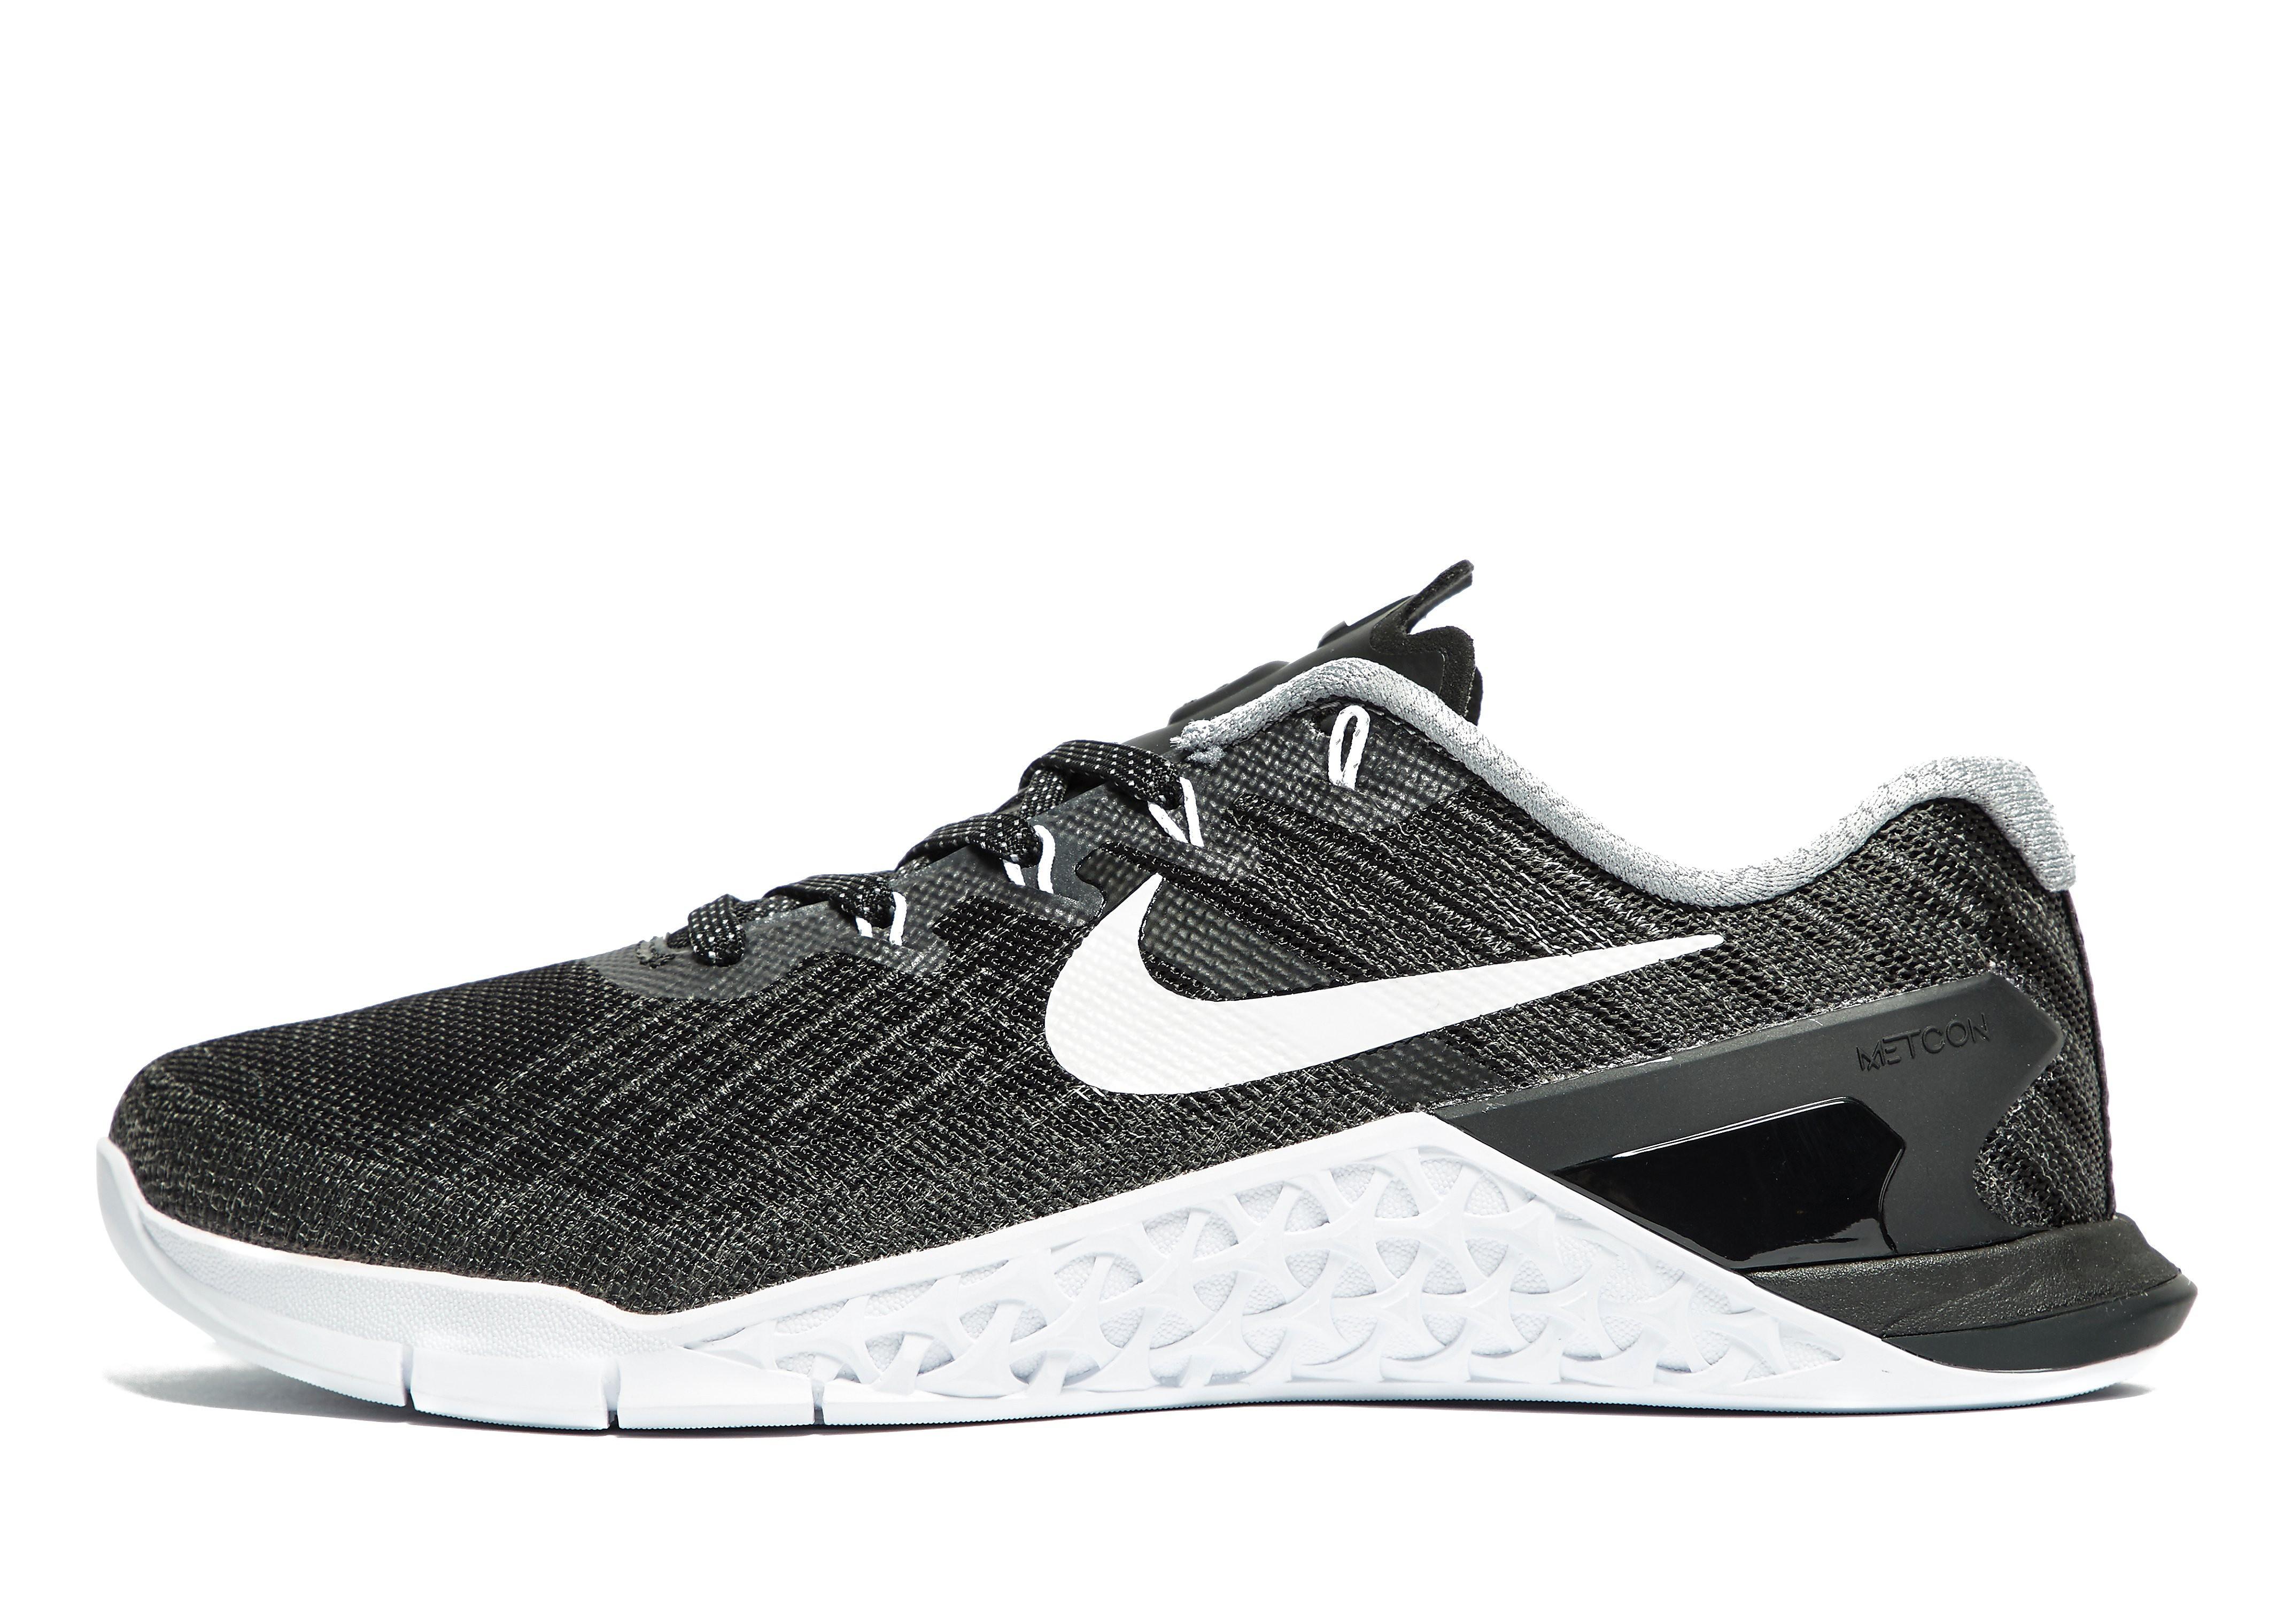 Nike Metcon 3 Women's